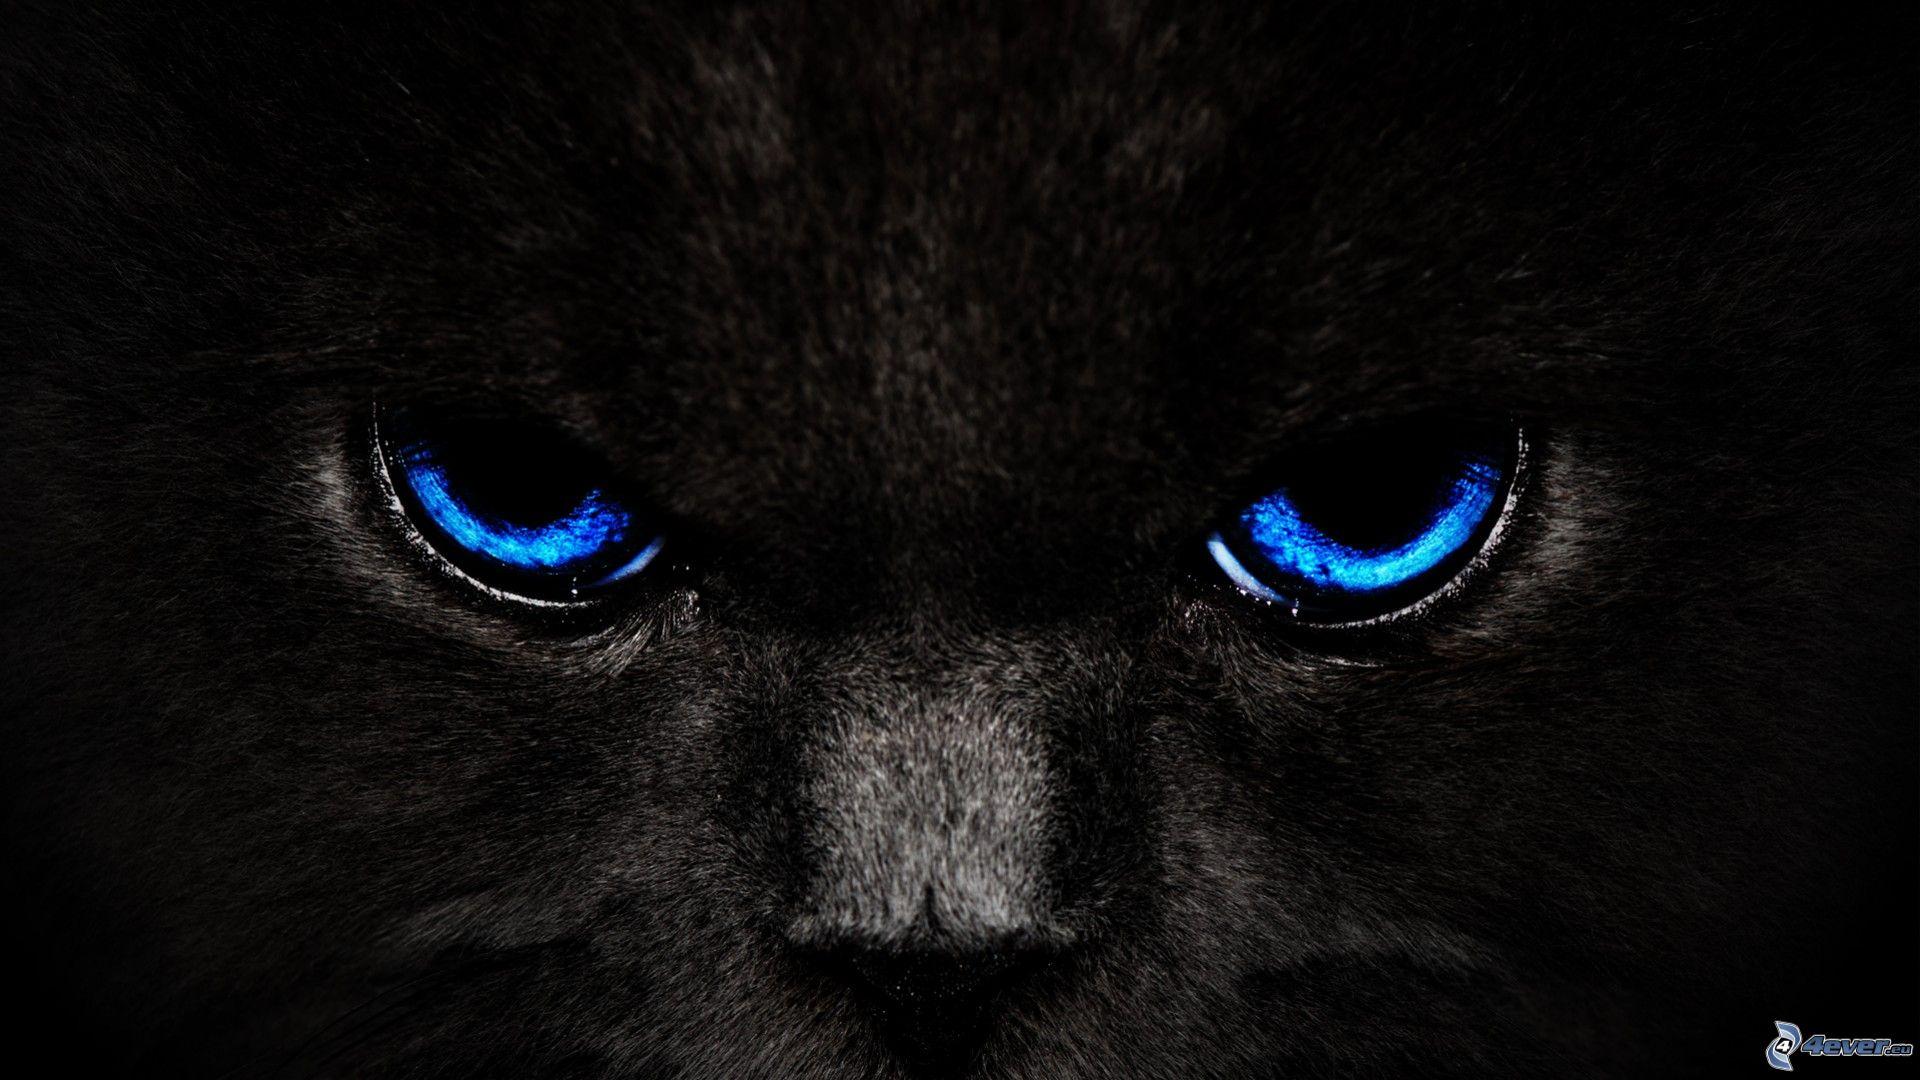 blue eyes wallpaper 2048x1152 - photo #5